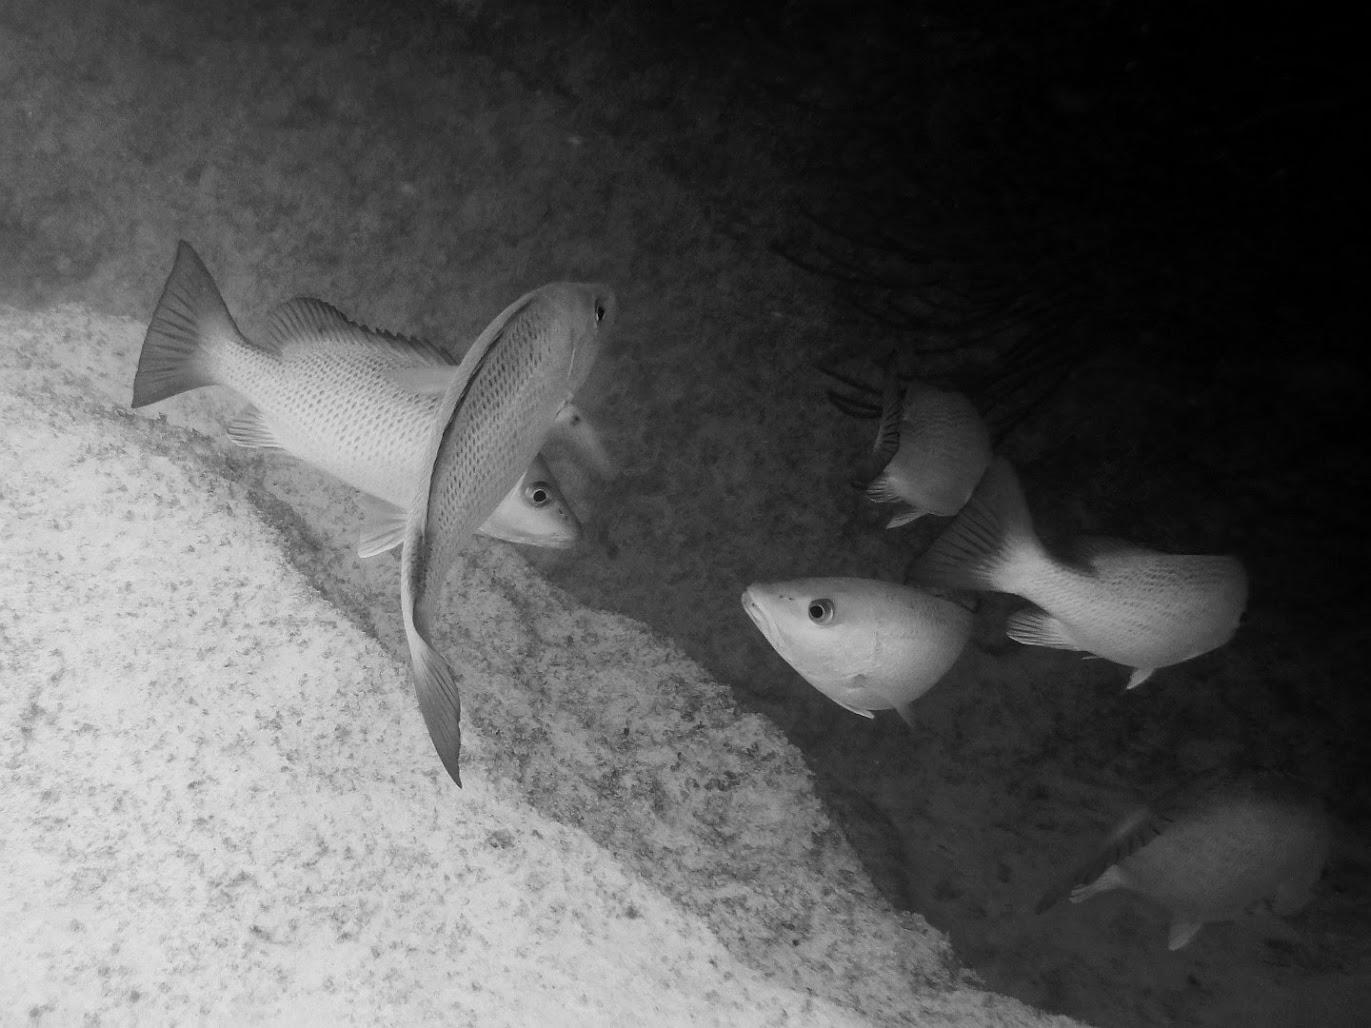 School of fish in Horseshoe Bay Cove, Southampton Parish, Bermuda